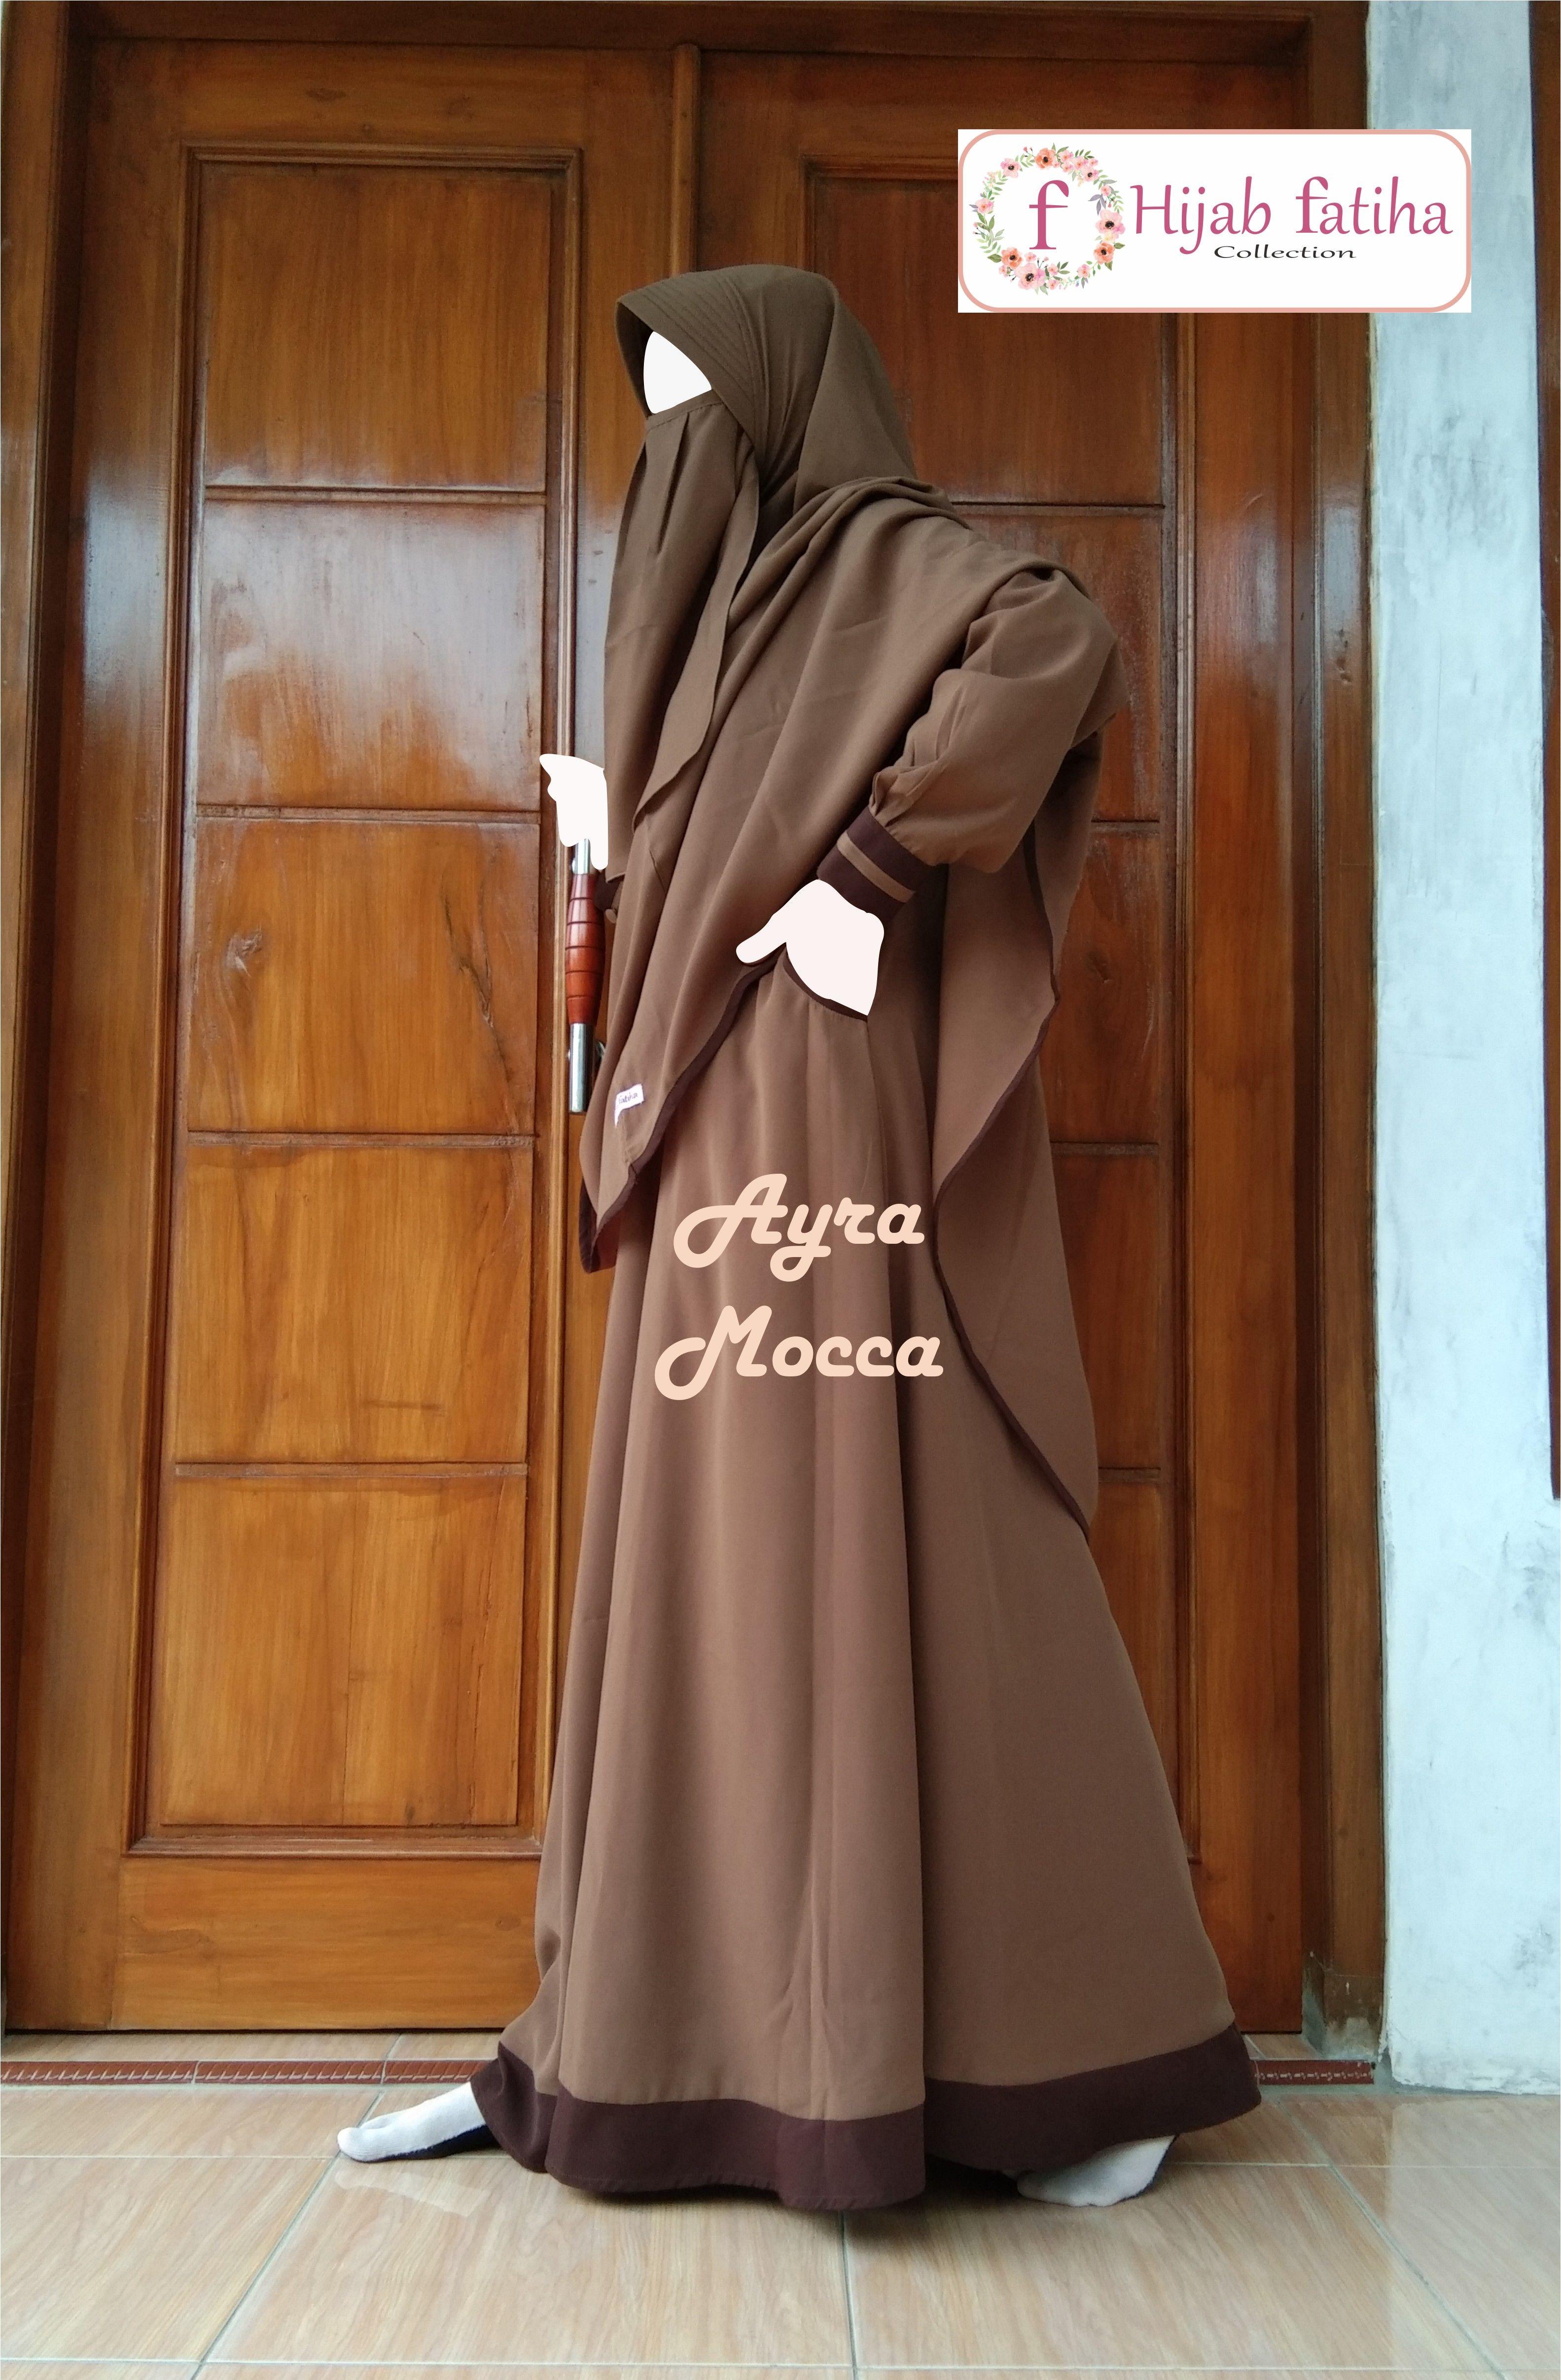 Gamis Terbaru, Gamis Wolfis, Gamis Modern Hijab Fatiha #jilbab